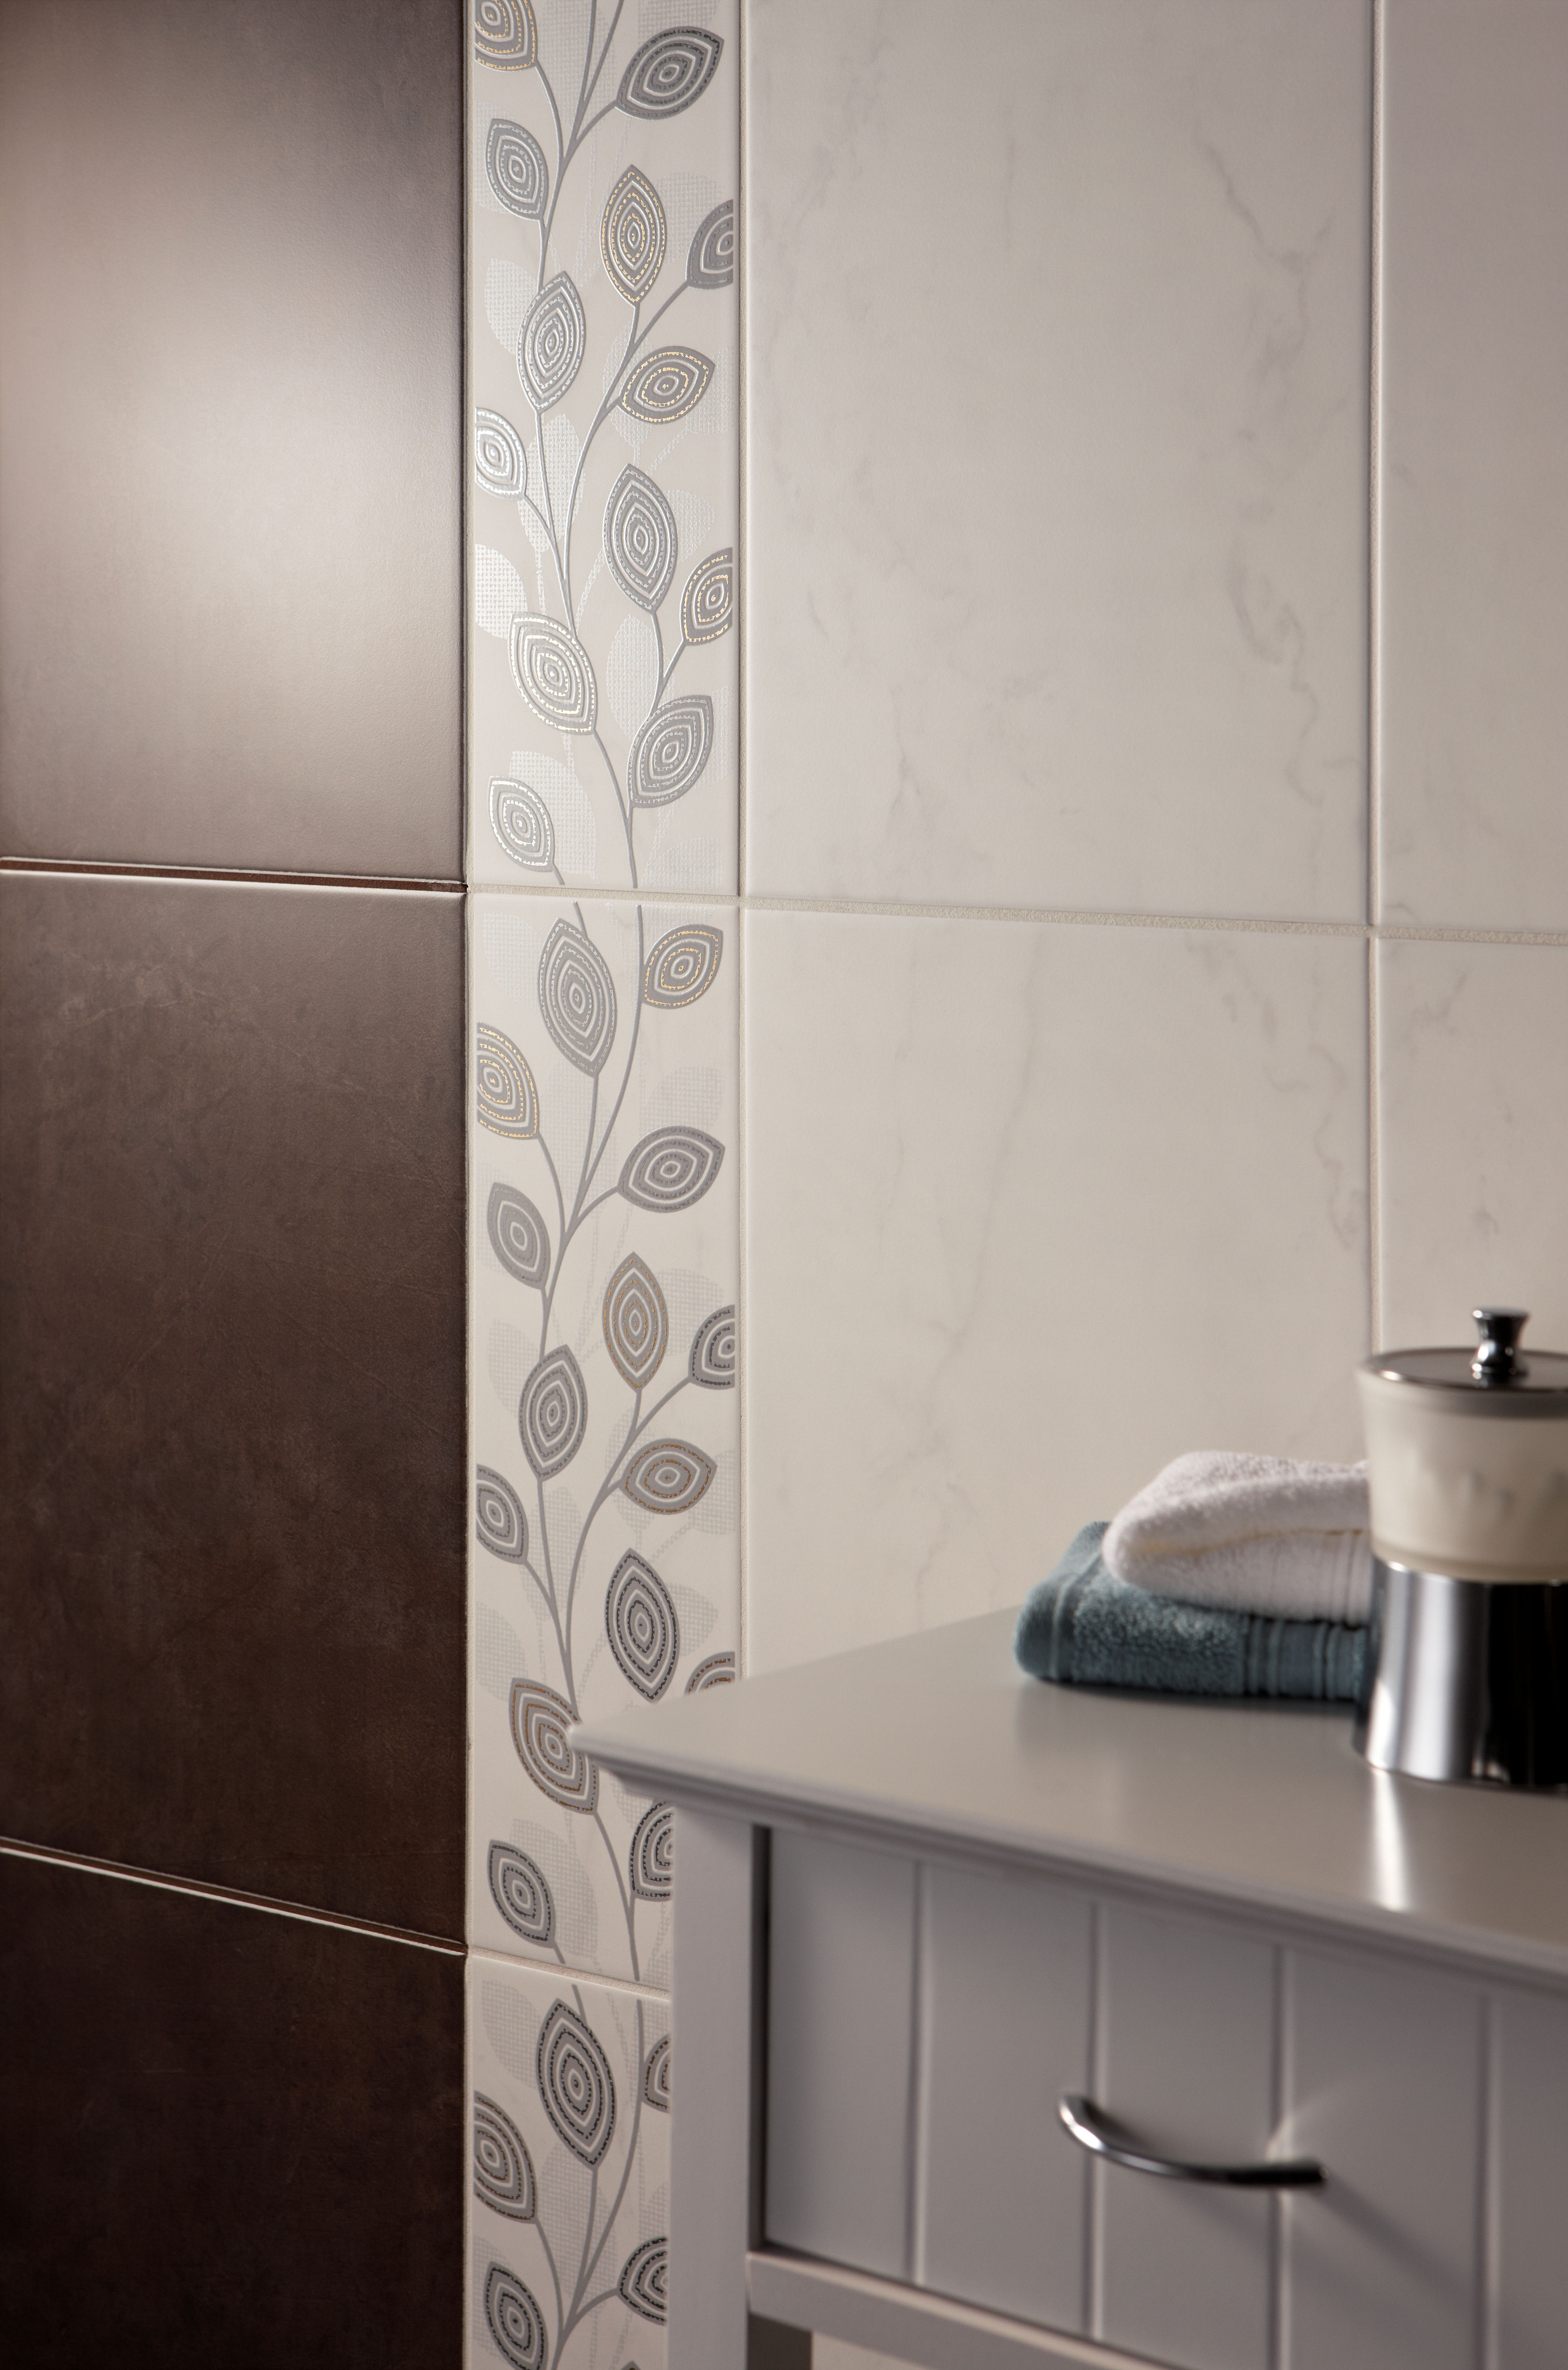 dartmoor naturals dolomite 248mm x 398mm wall tile 10 per pack can43589 porcelain bathroom tiles bathroom tiles tiles